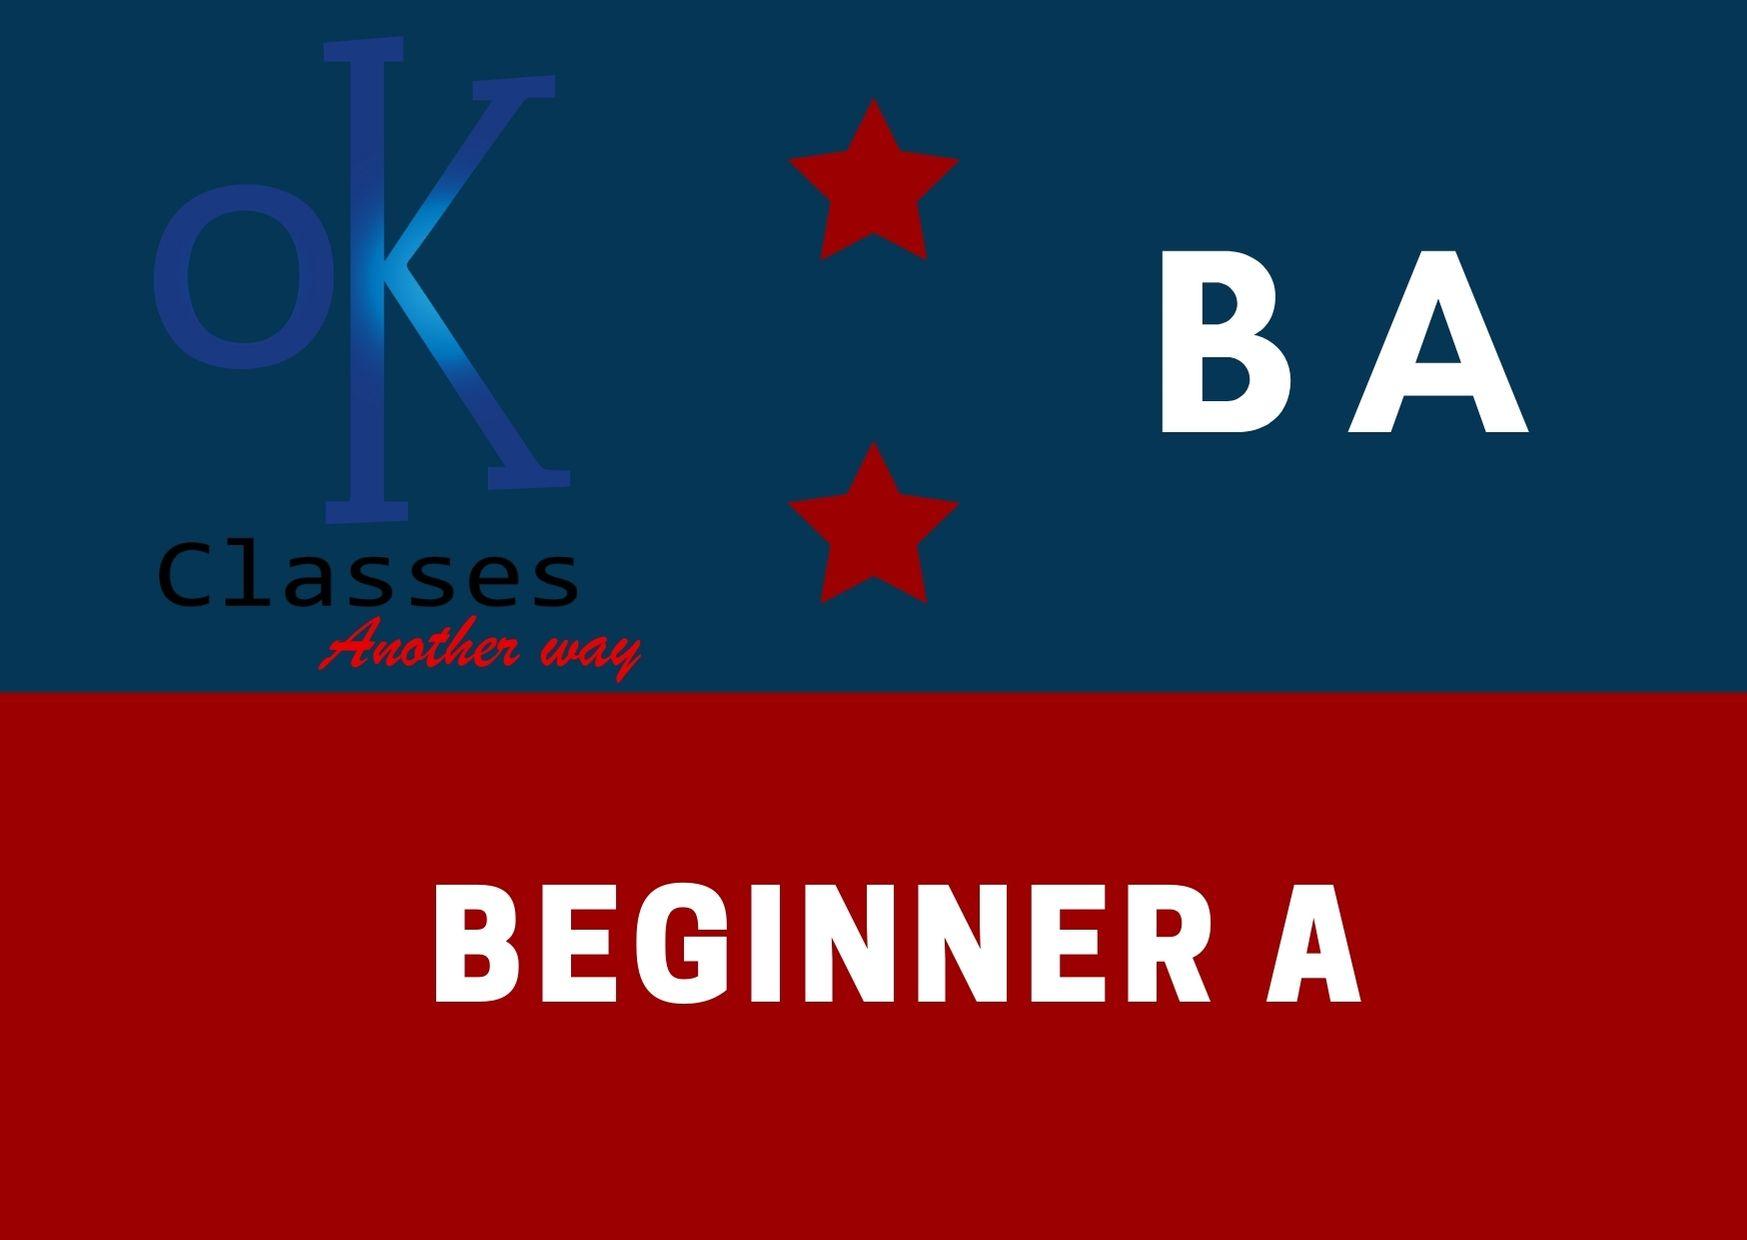 Ok Classes Beginner A